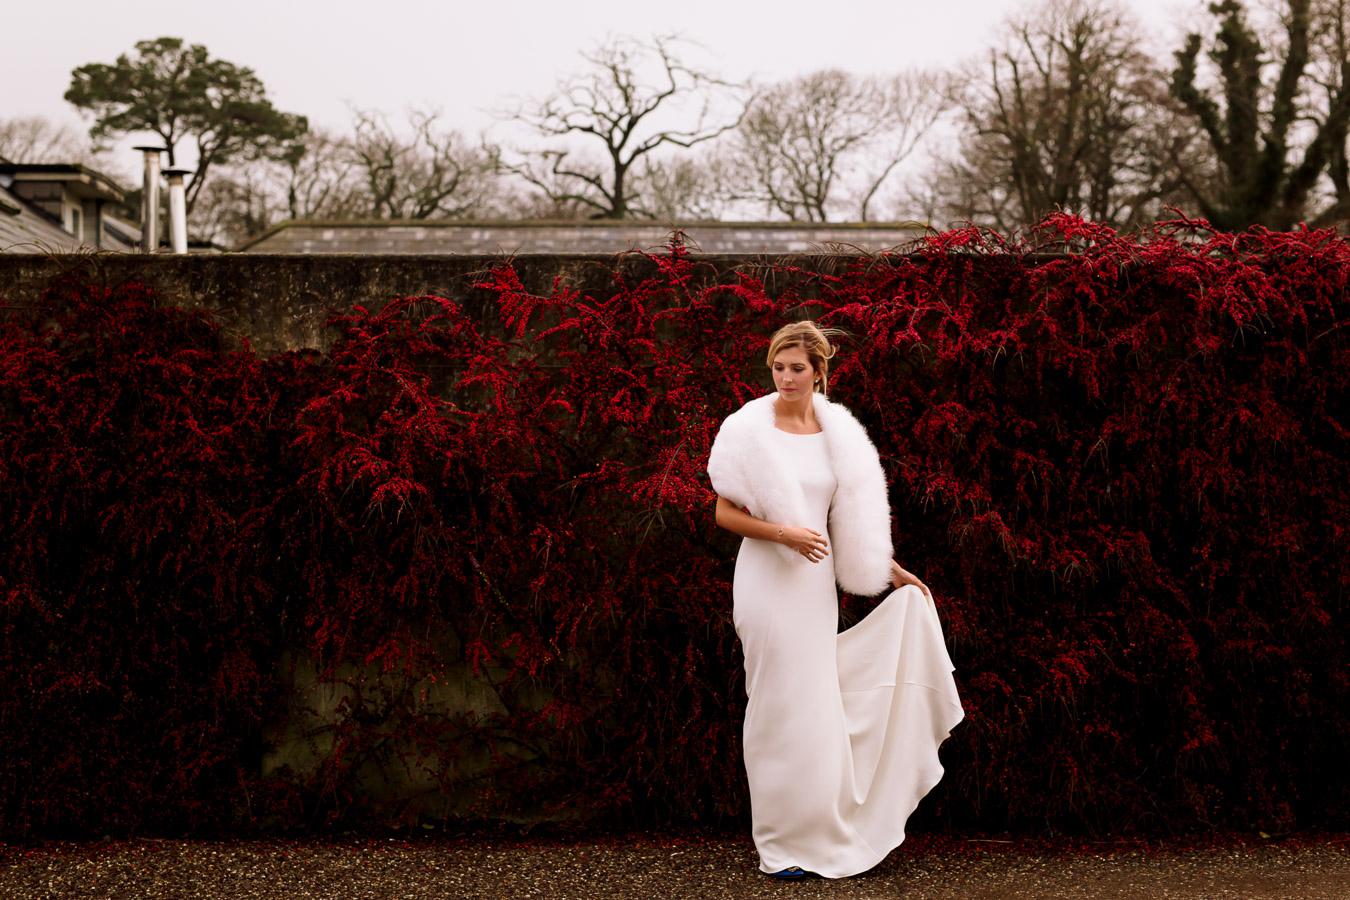 jenny peckham wedding dress